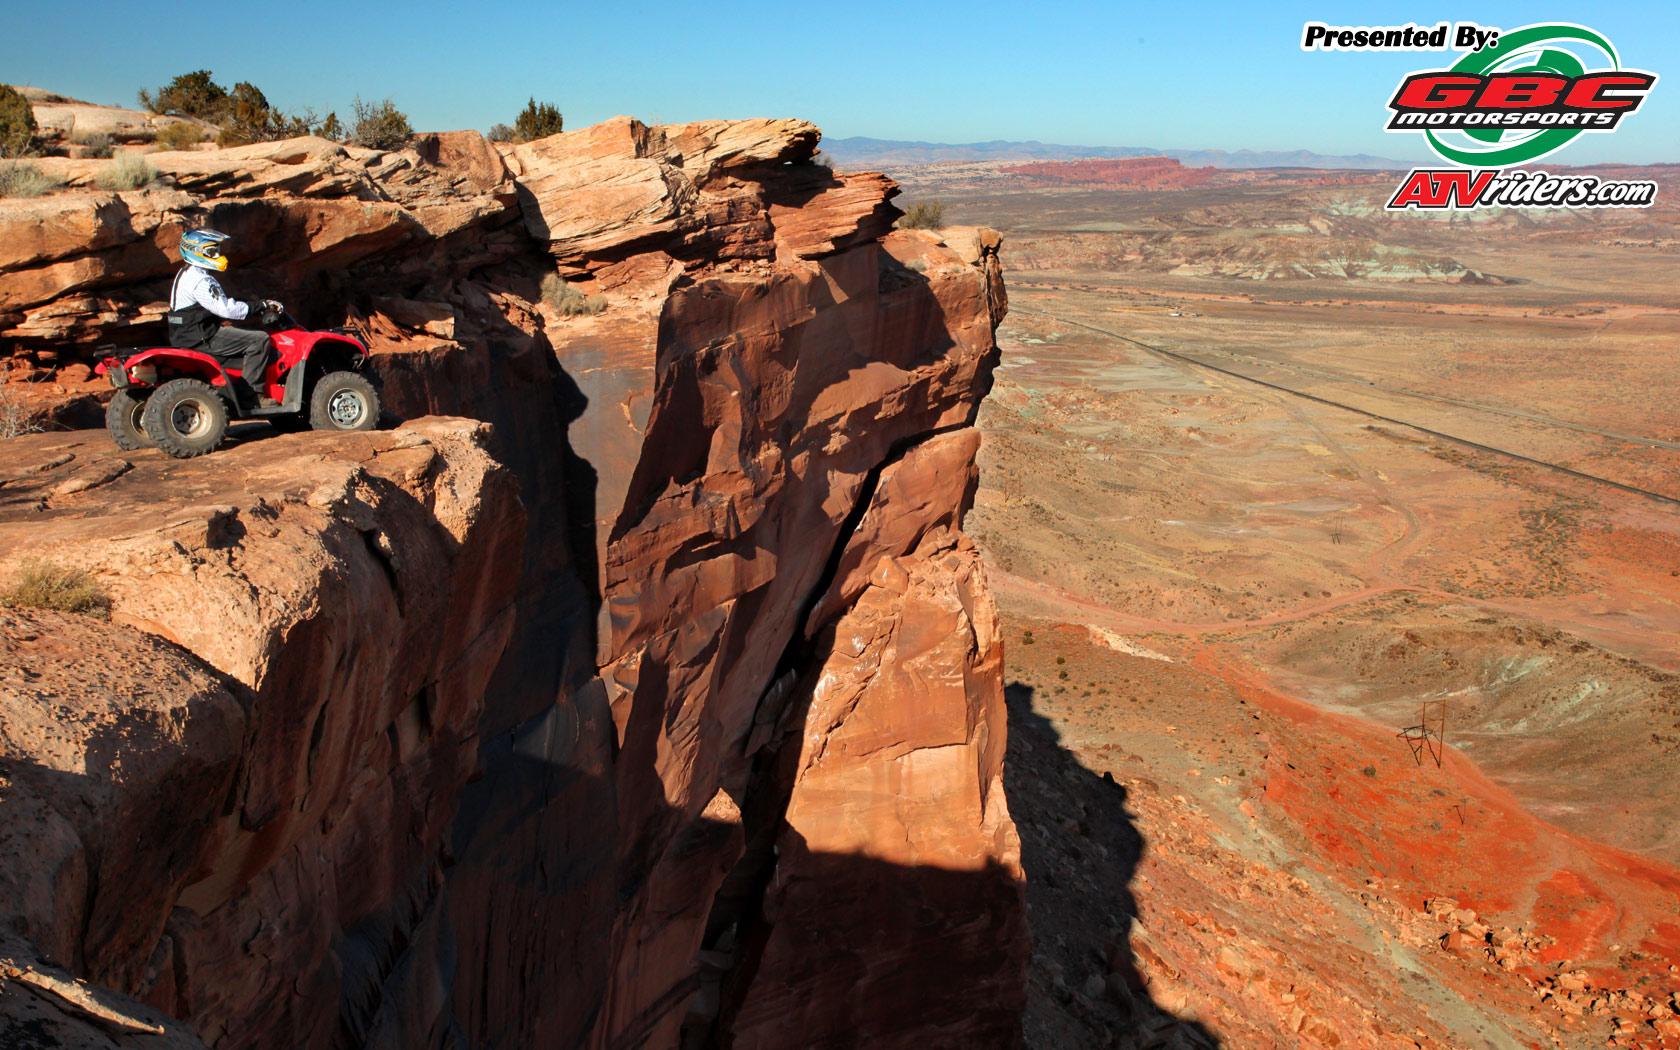 2011 Honda Rancher 420 Es Utility Atv Moab 7 Mile Rim Trail Quot Gbc Motorsports Wednesday